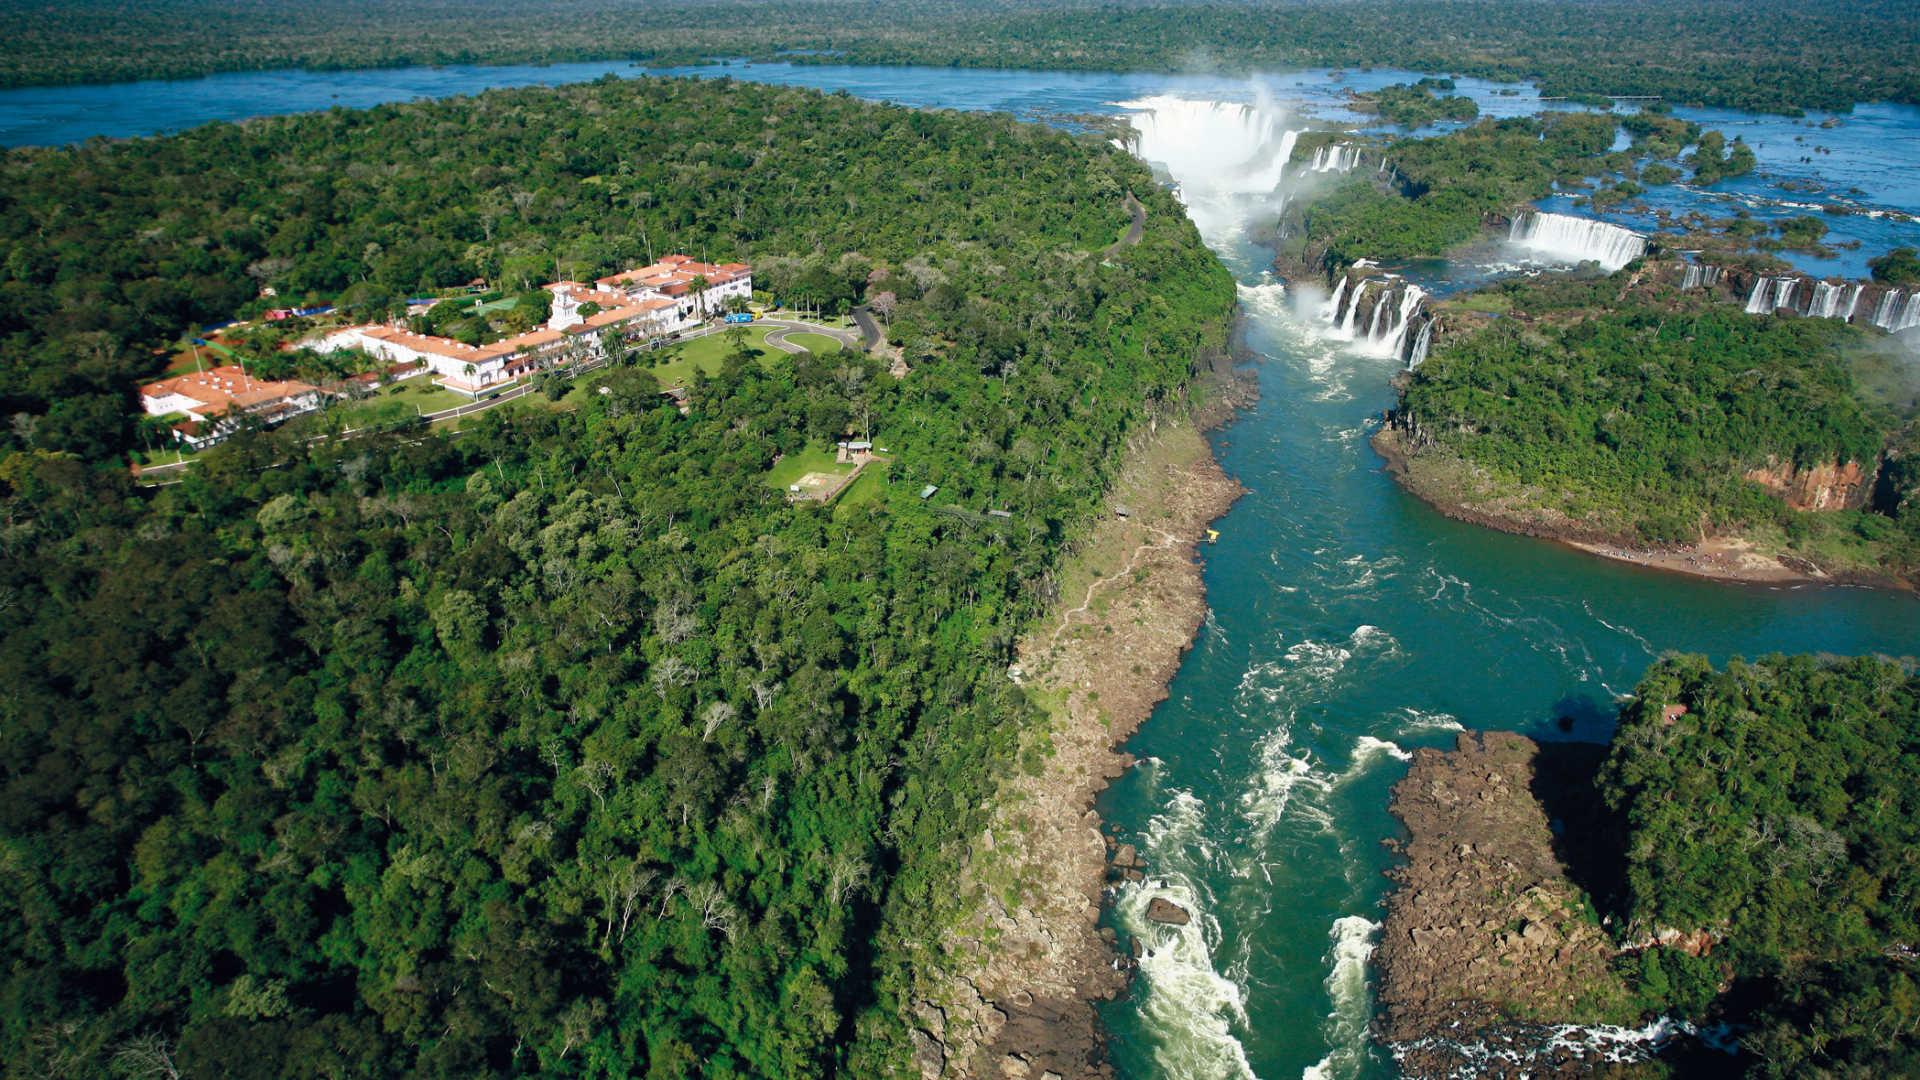 belmond-hotel-das-cataratas-iguacu